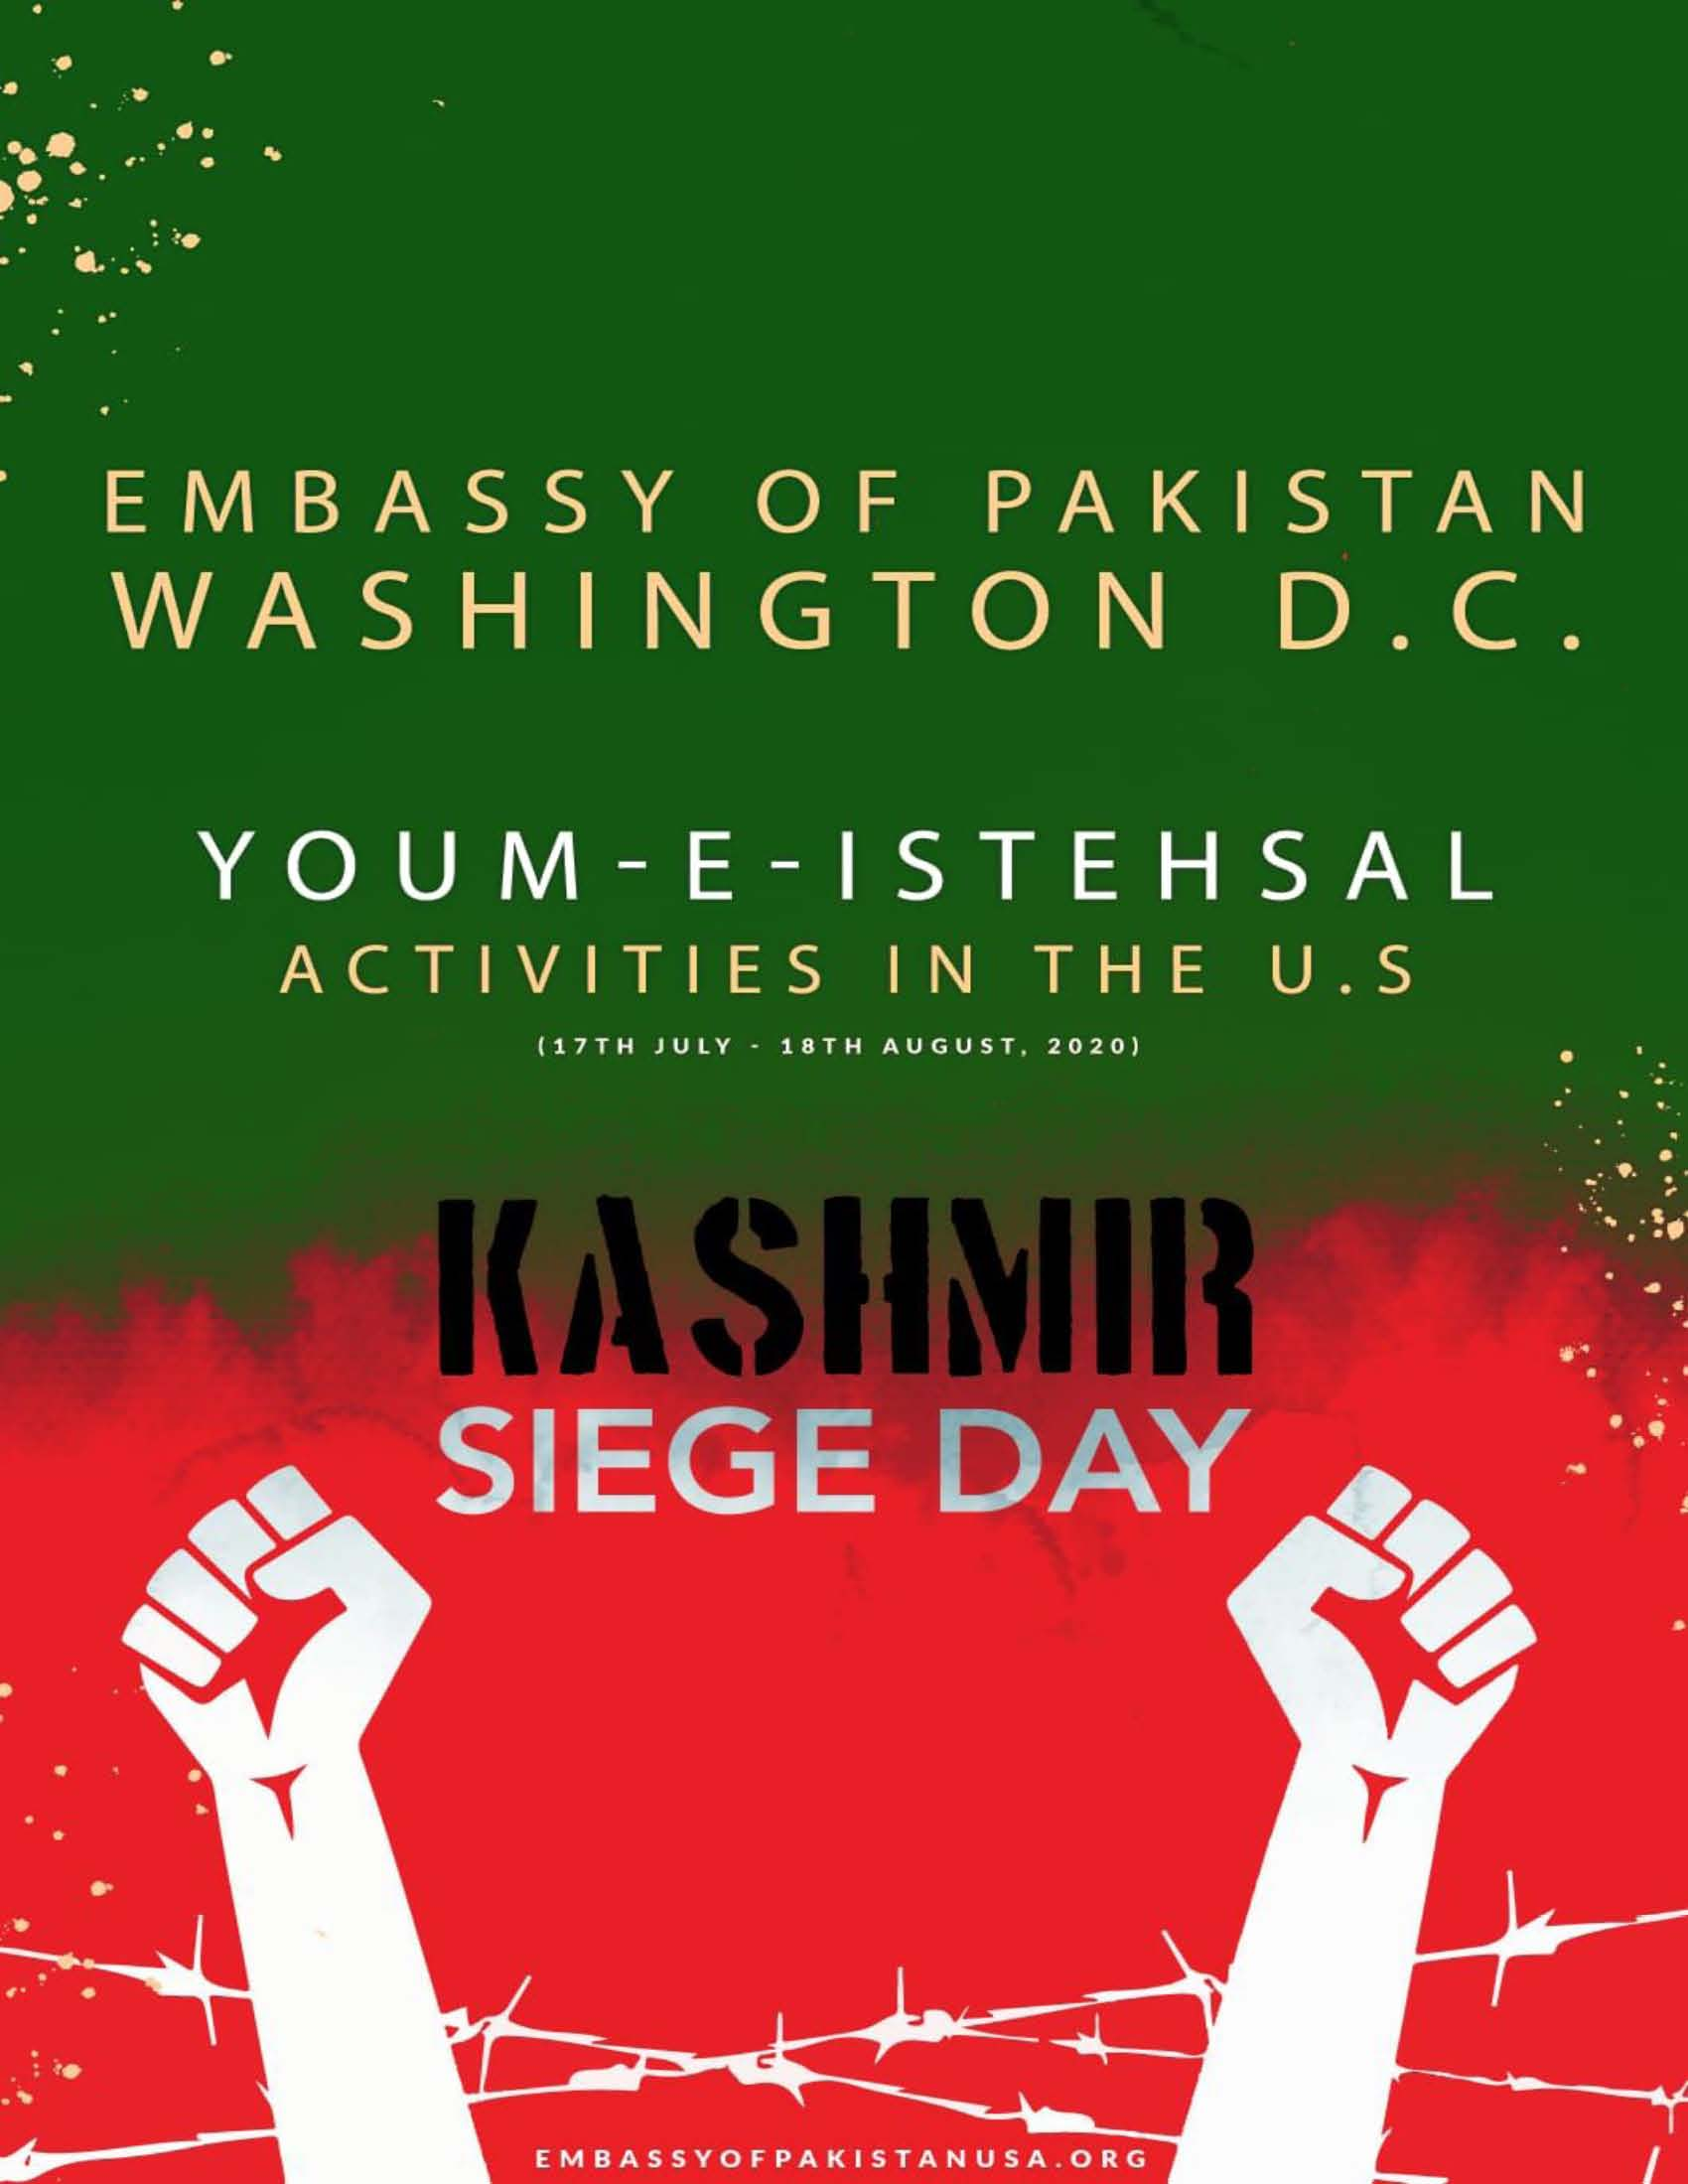 Youm-e-Istehsal-KASHMIR-SIEGE-DAY-